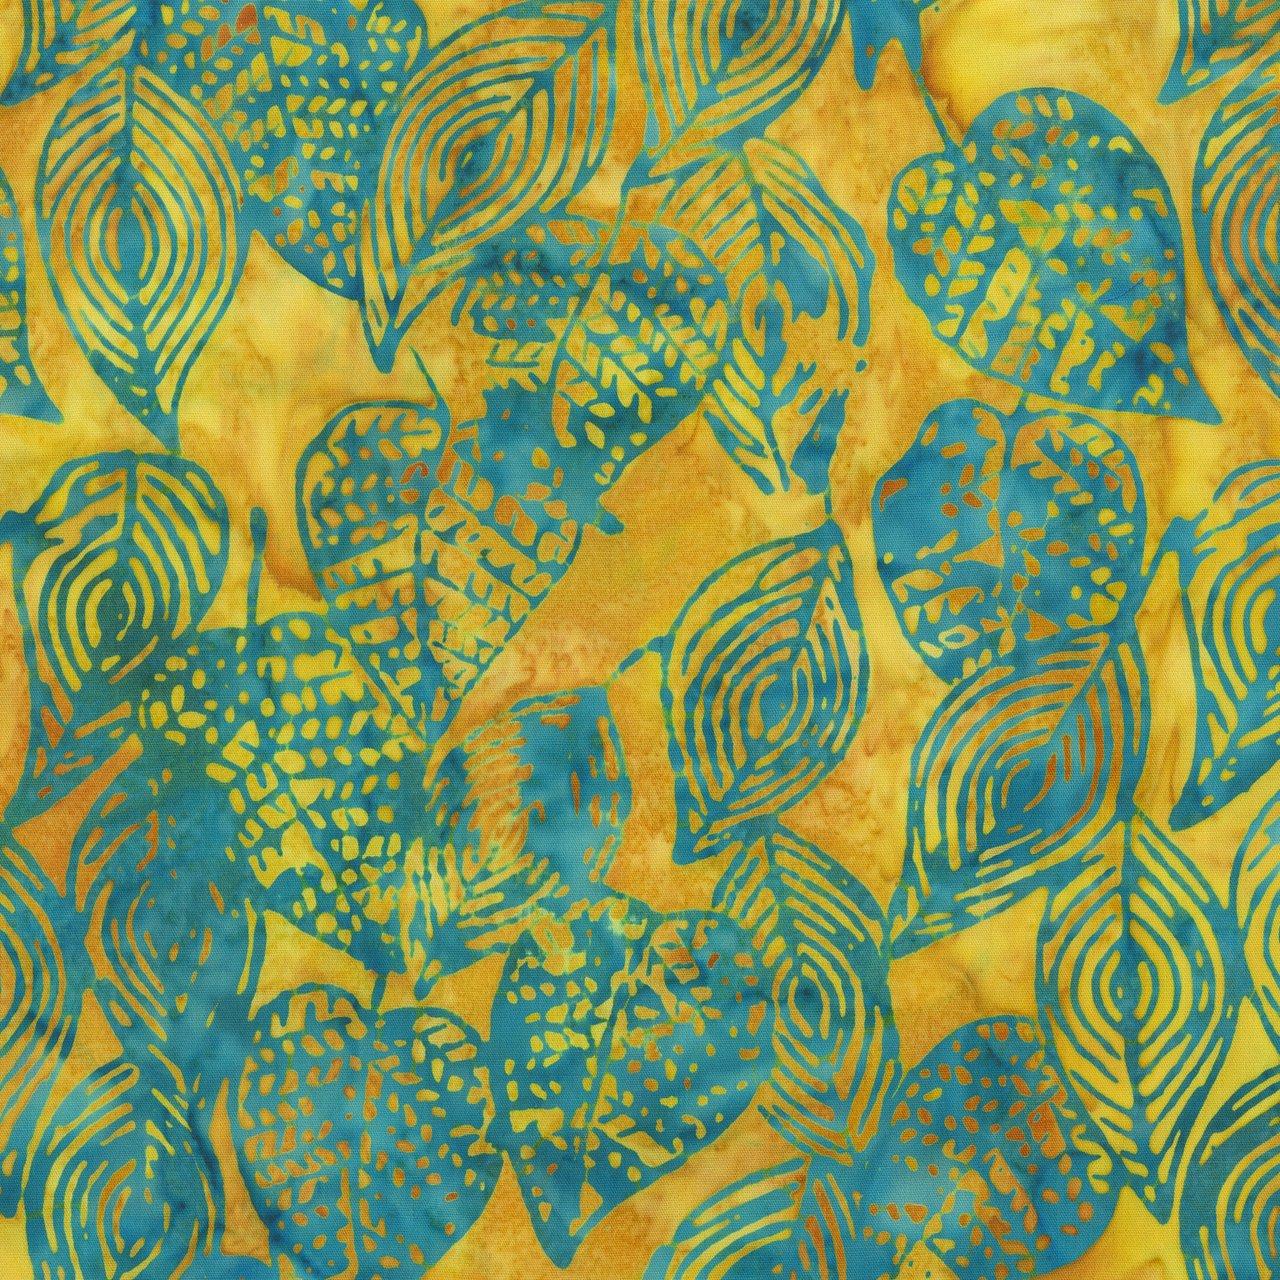 Art Inspired: Van Gogh's Chair Scribbled Leaves 232Q-11 Fool's Gold